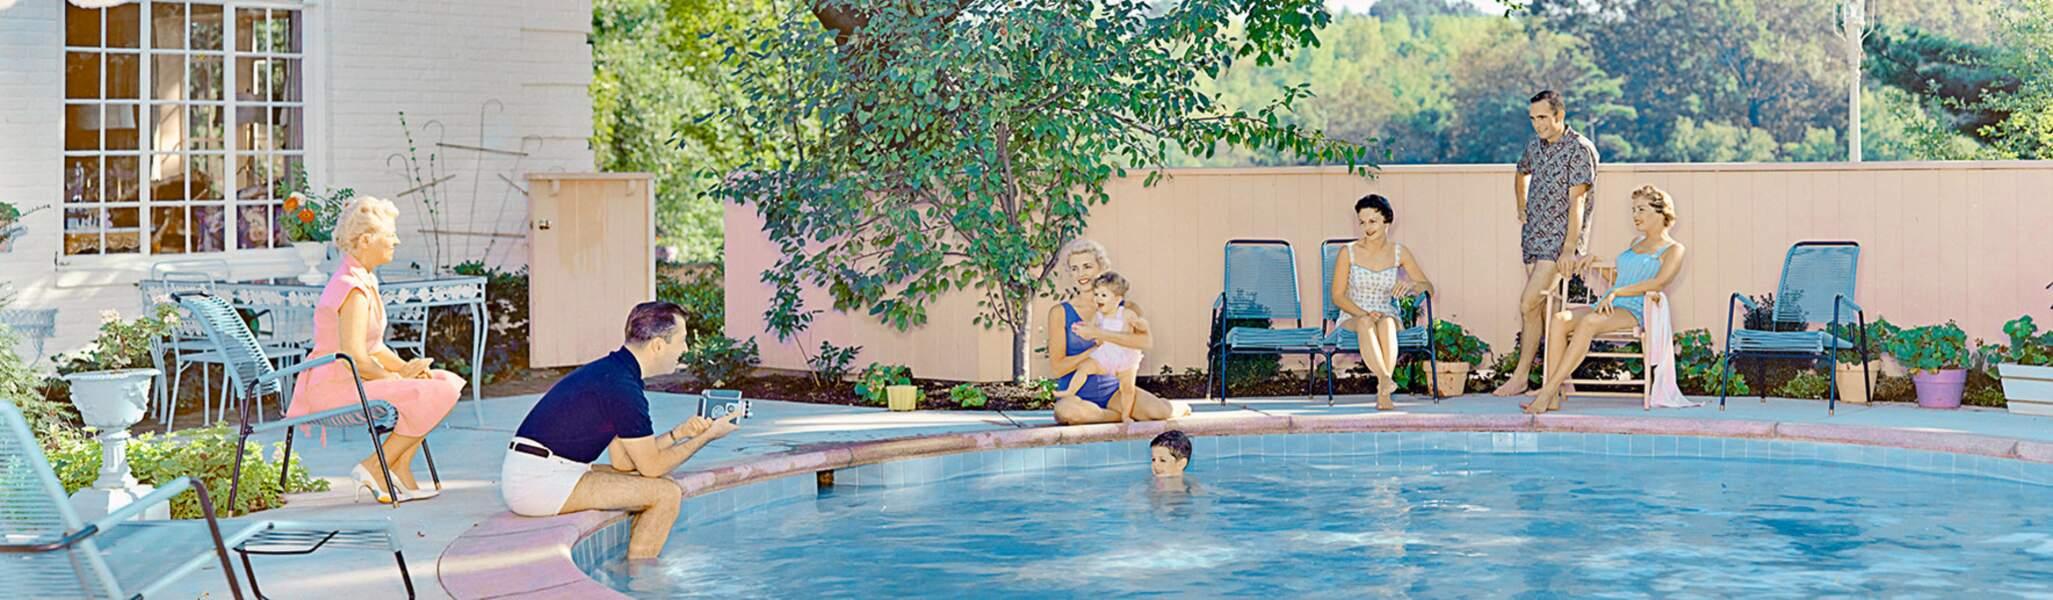 Family Swimming Pool, 1960